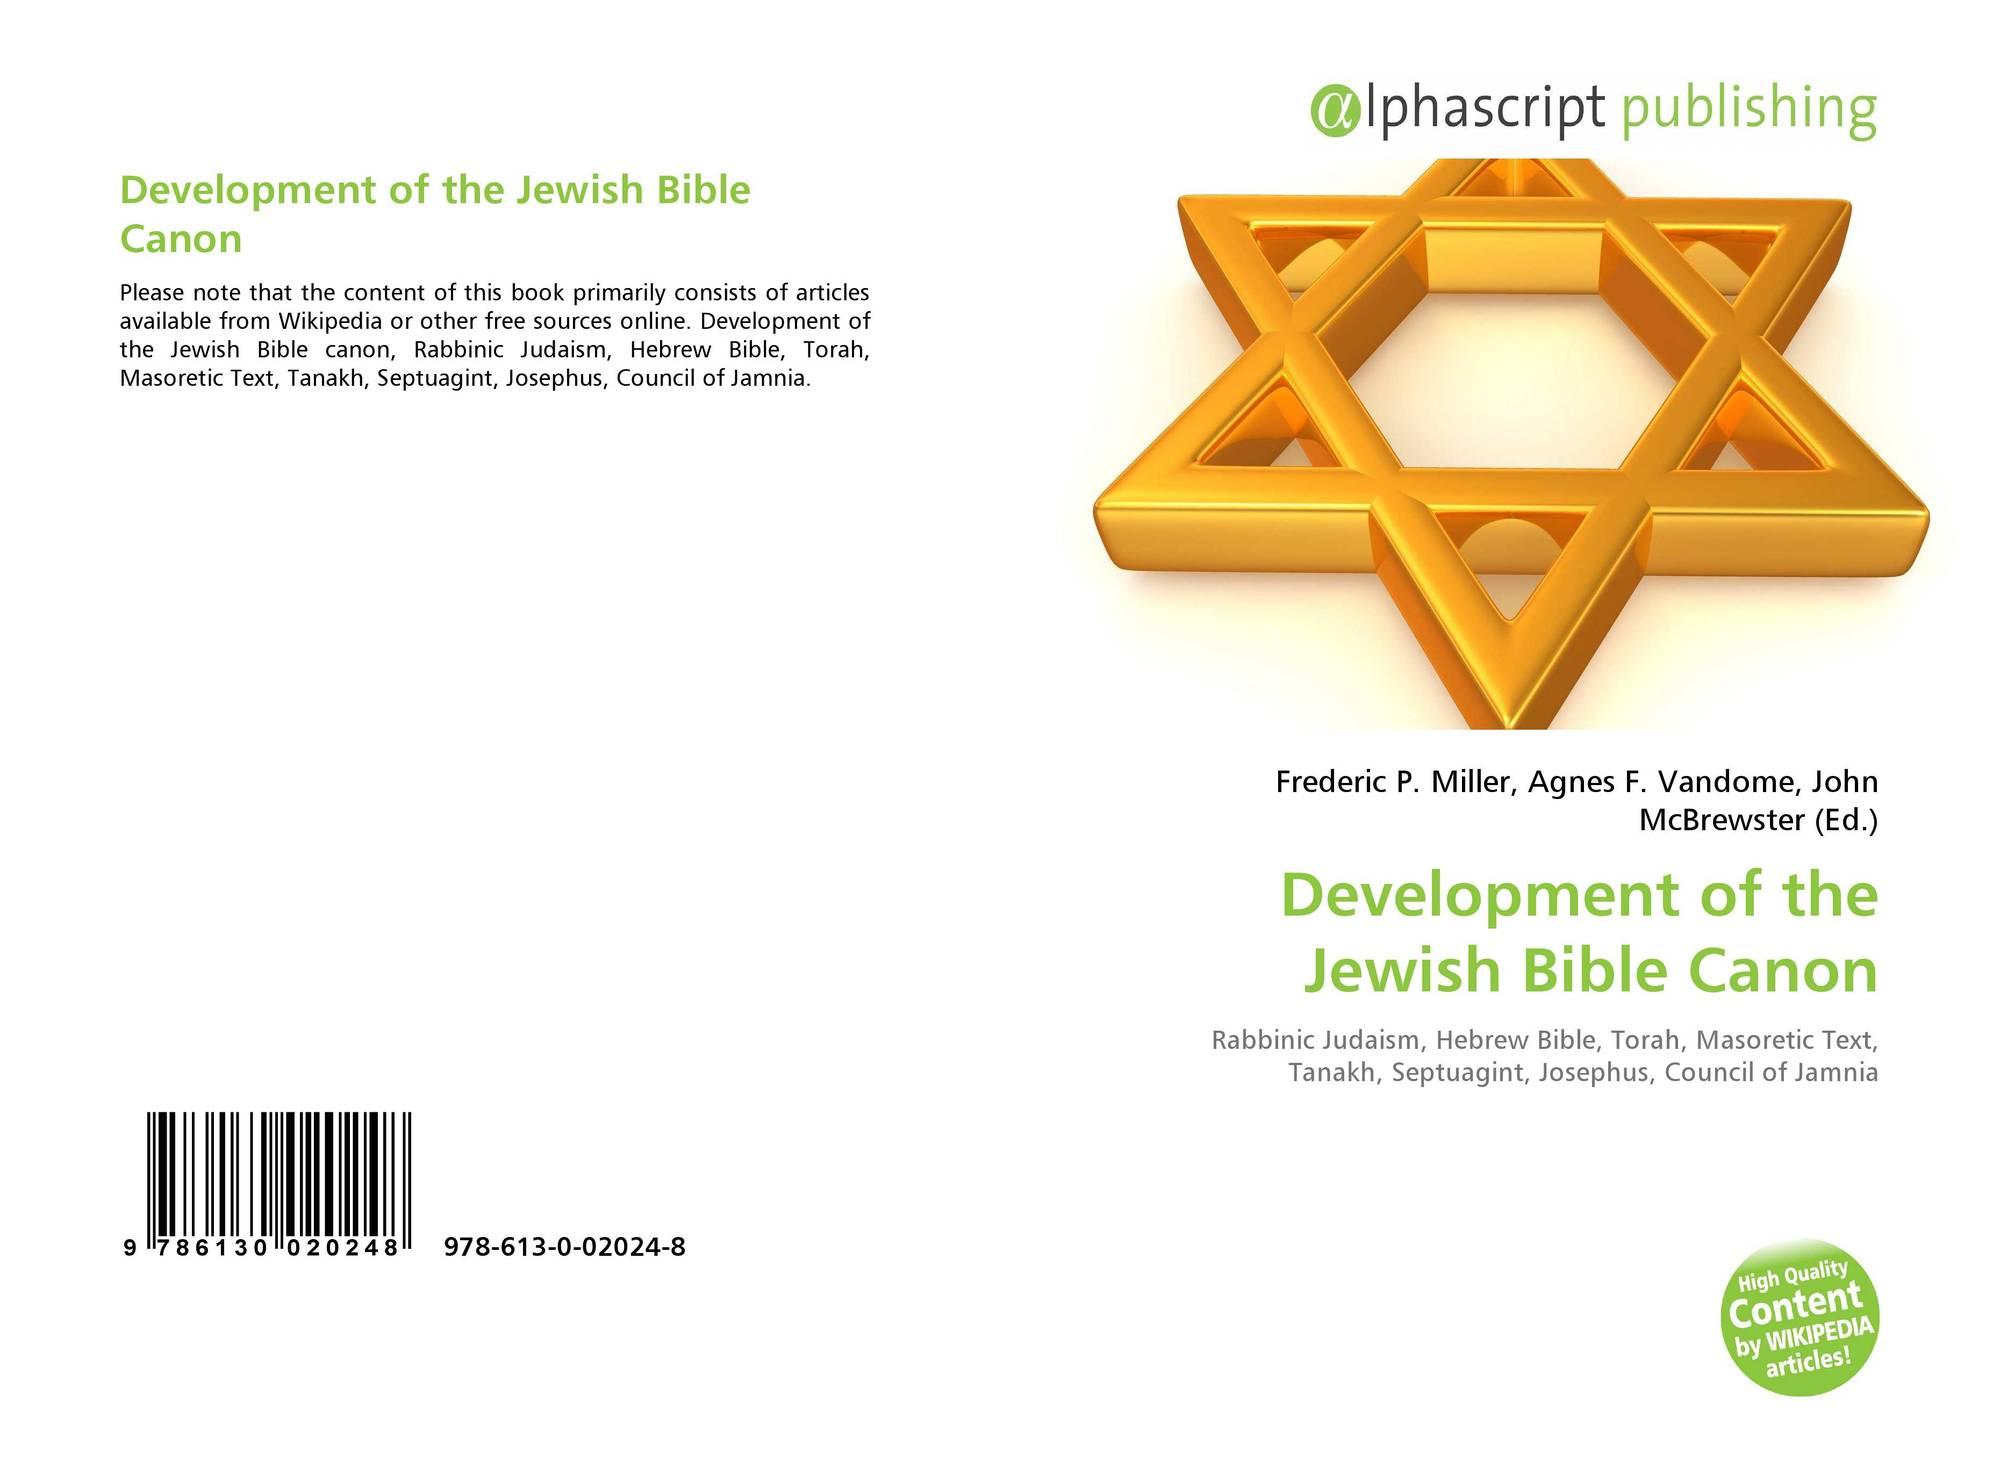 Development of the Jewish Bible Canon, 978-613-0-02024-8, 6130020244